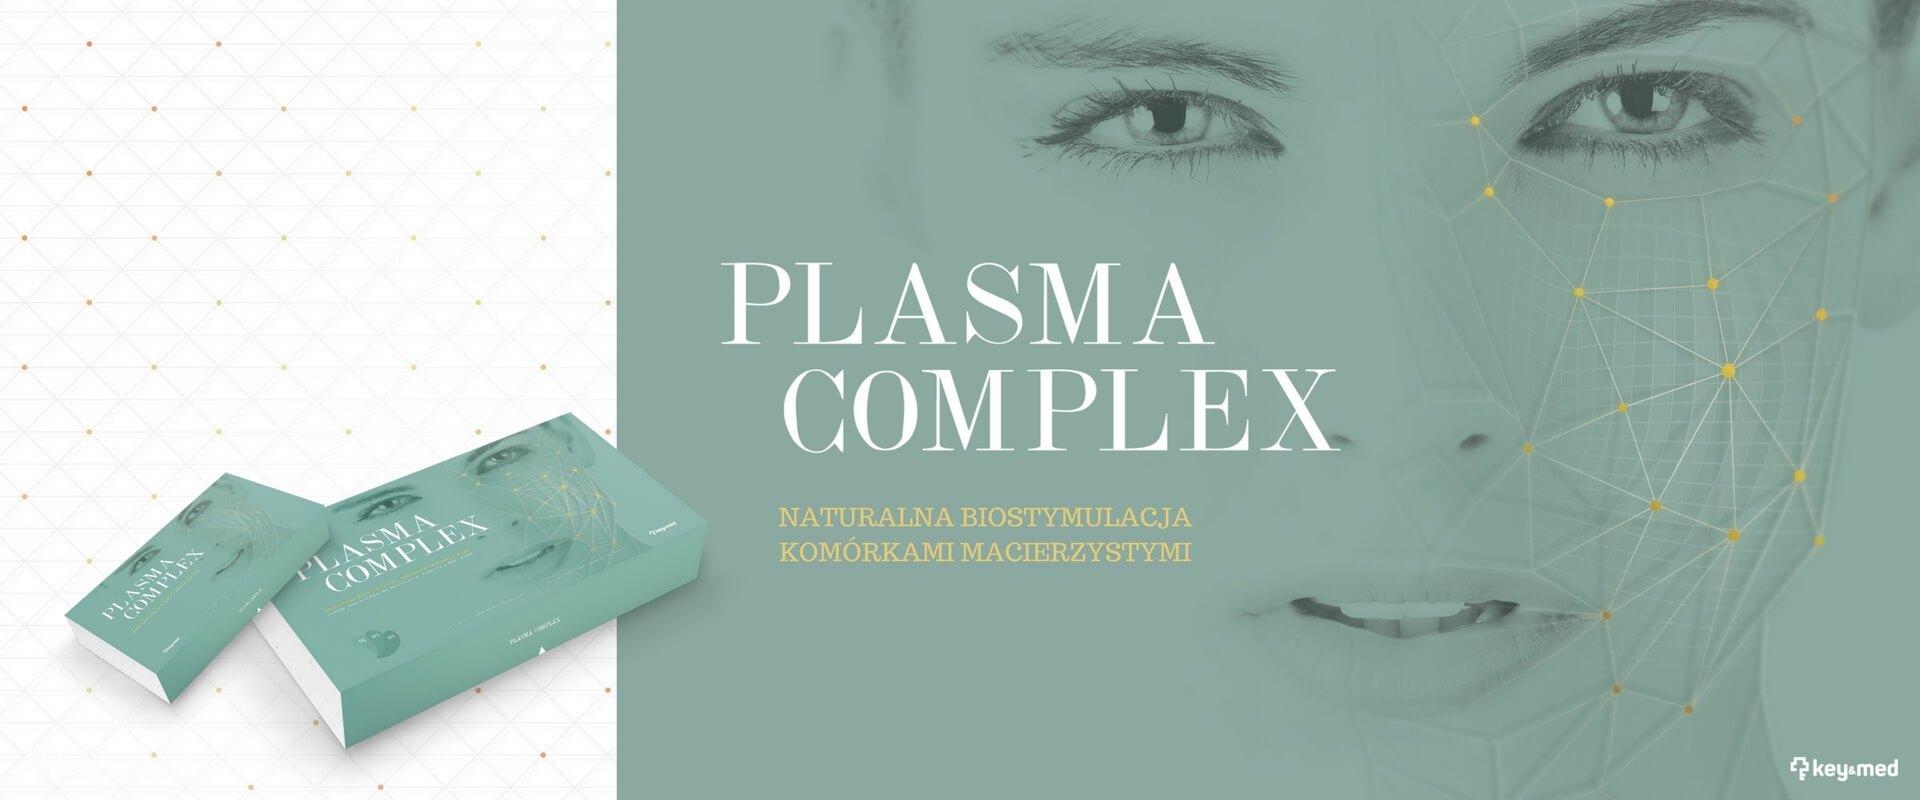 Plasma Complex